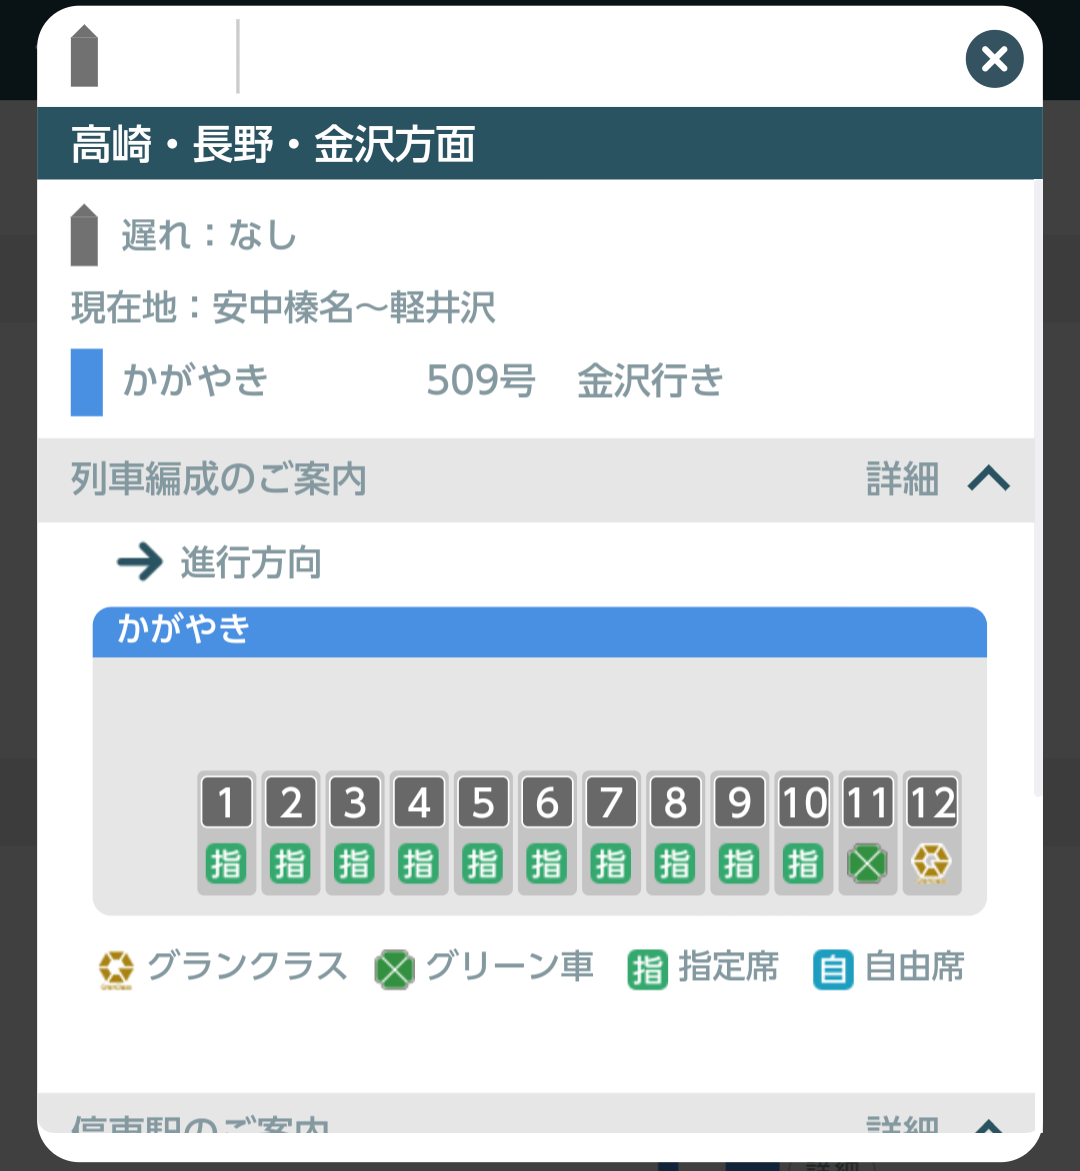 JR東日本アプリの列車走行位置表示>列車詳細から編成表示がないと、新潟車両センターの応援編成